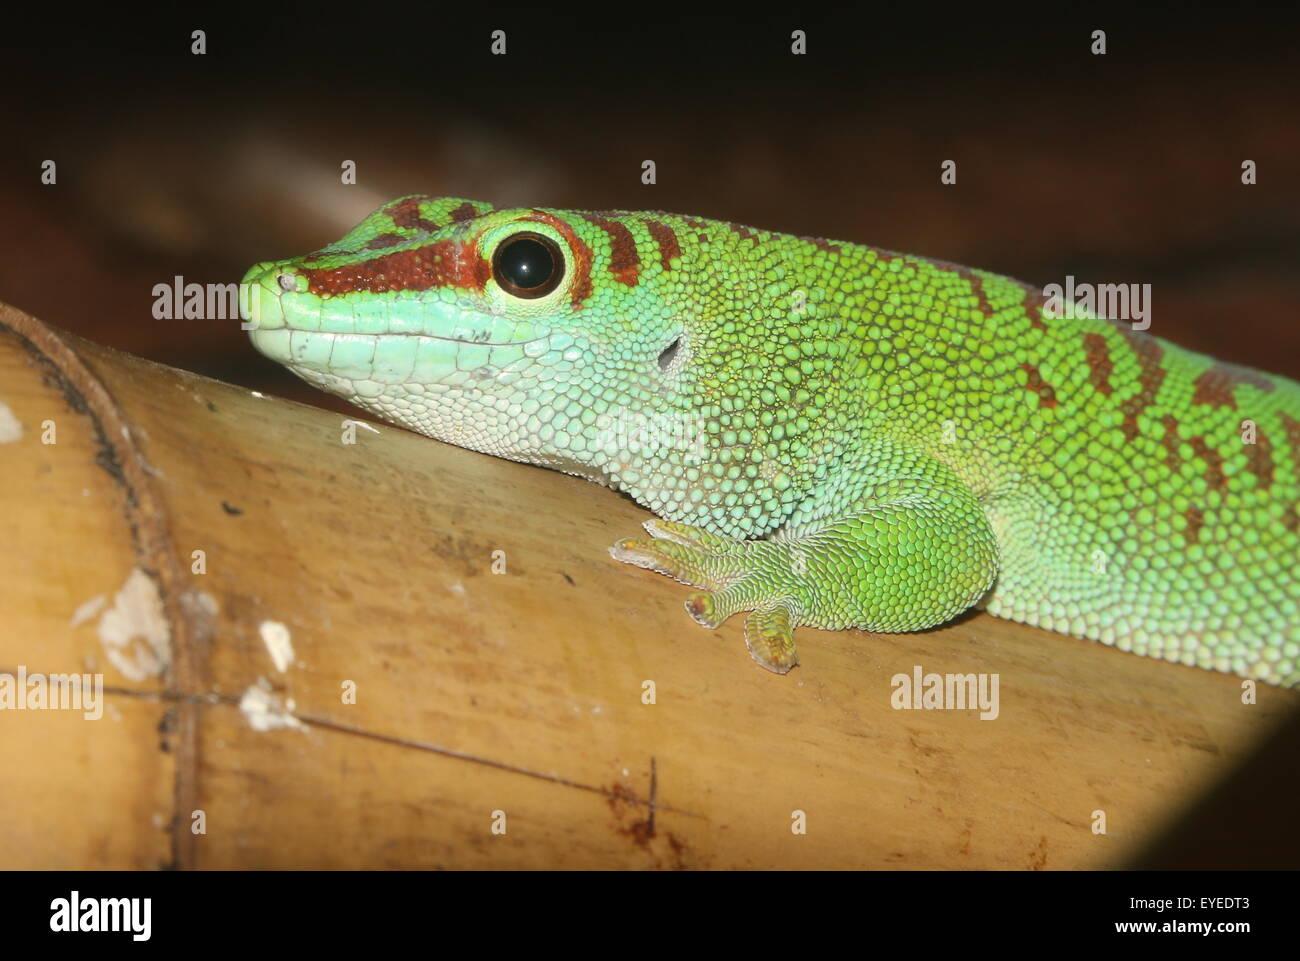 Green Madagascar Day Gecko (Phelsuma madagascariensis) Stock Photo